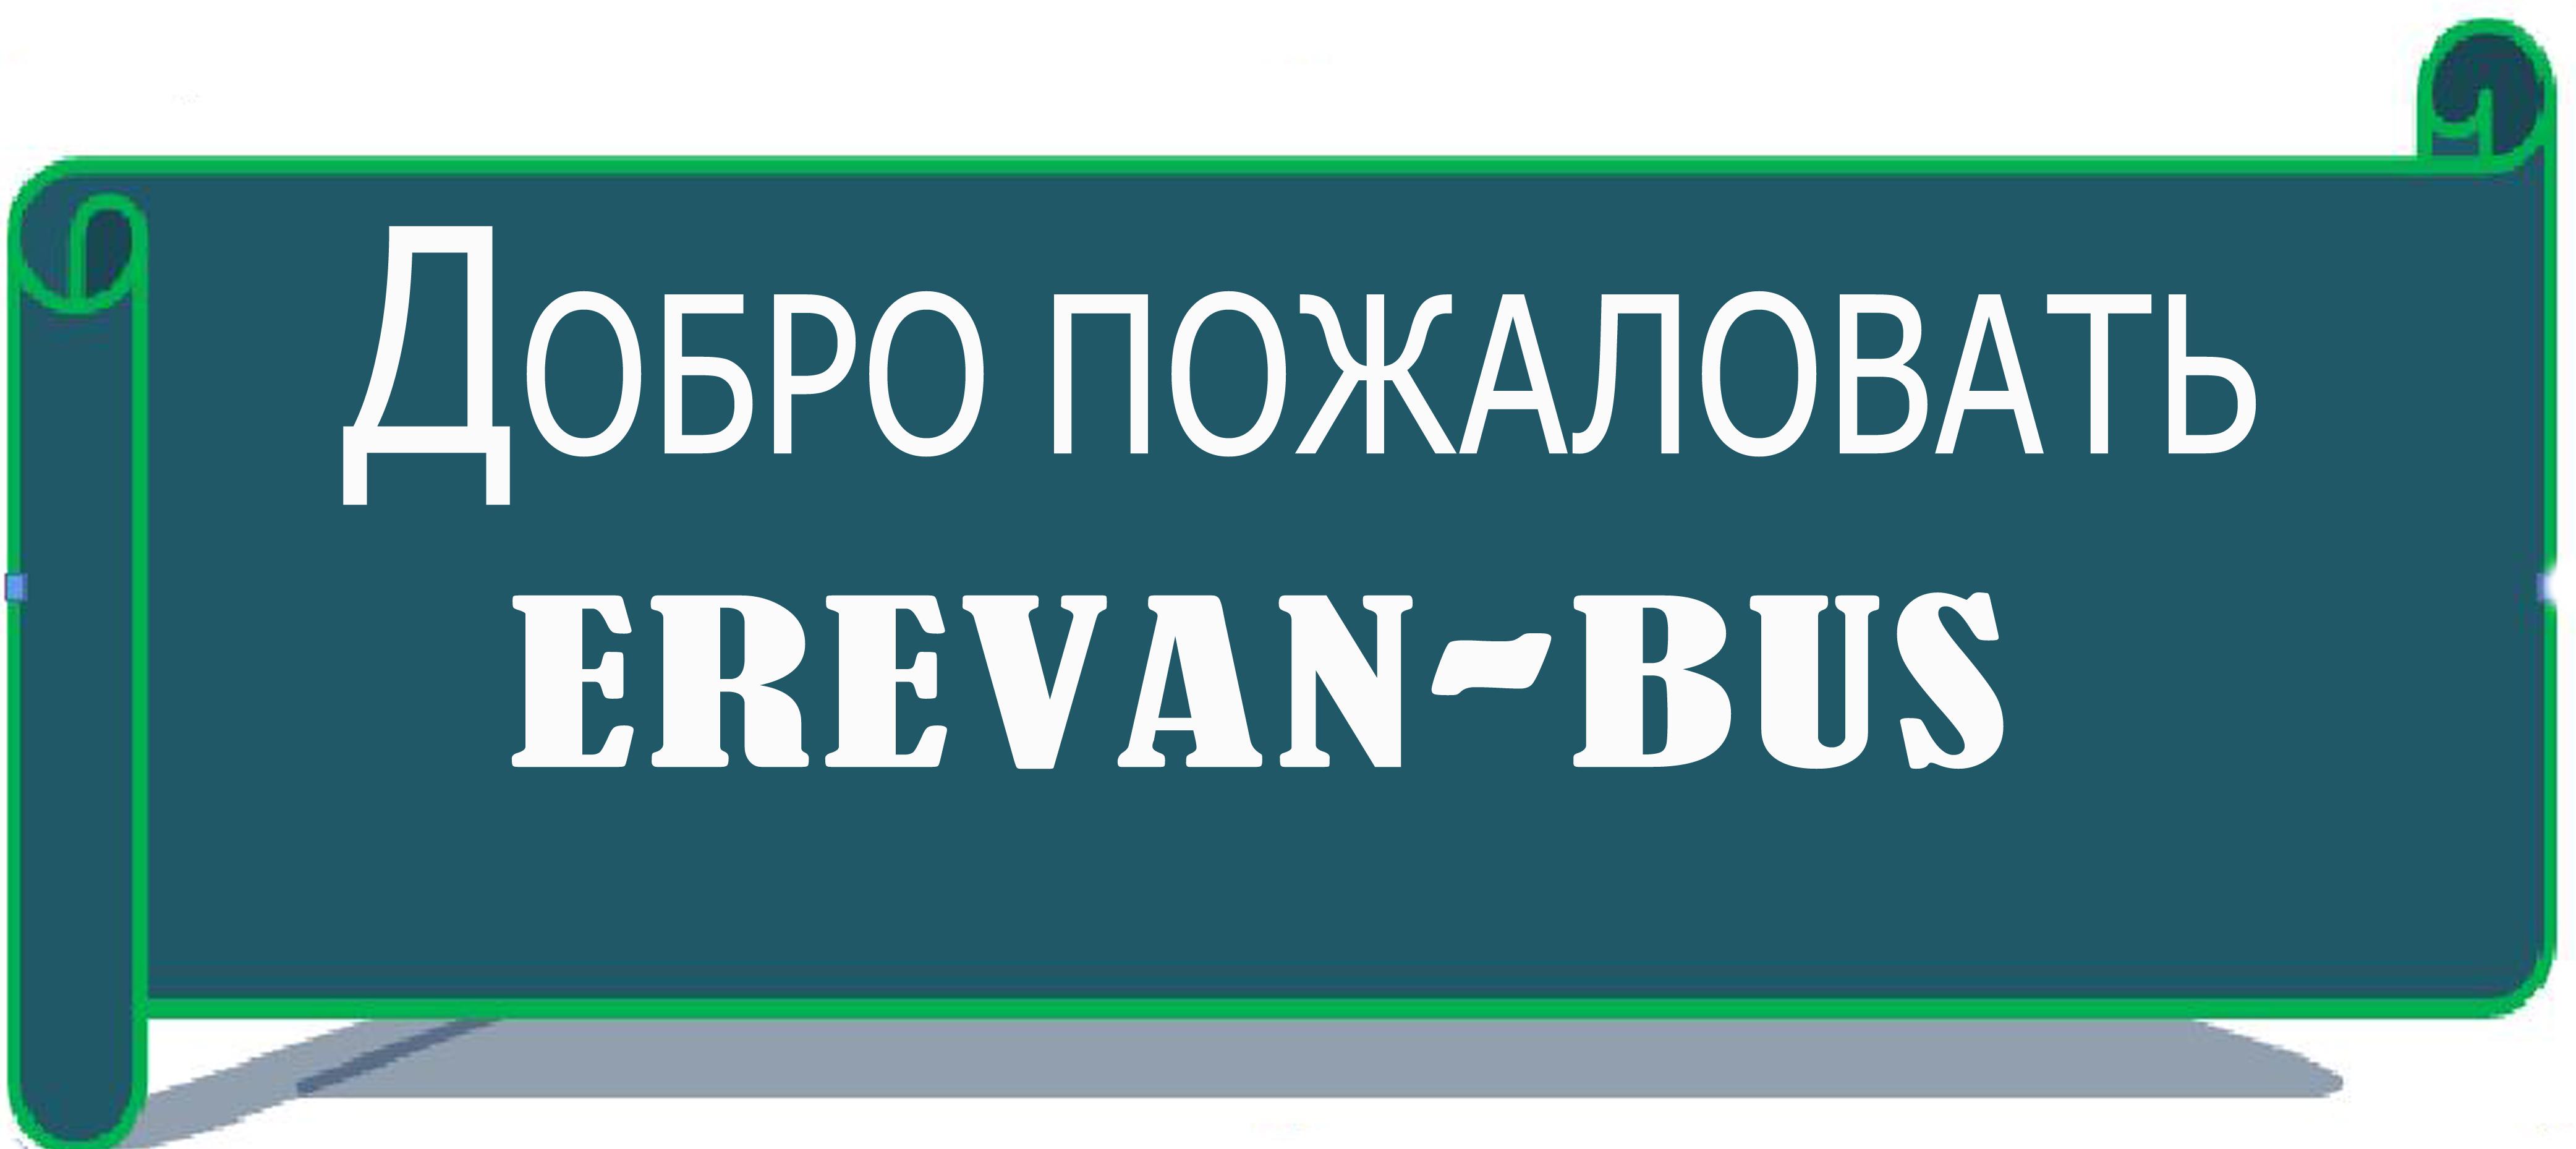 Рейс автобуса Оренбург Ереван